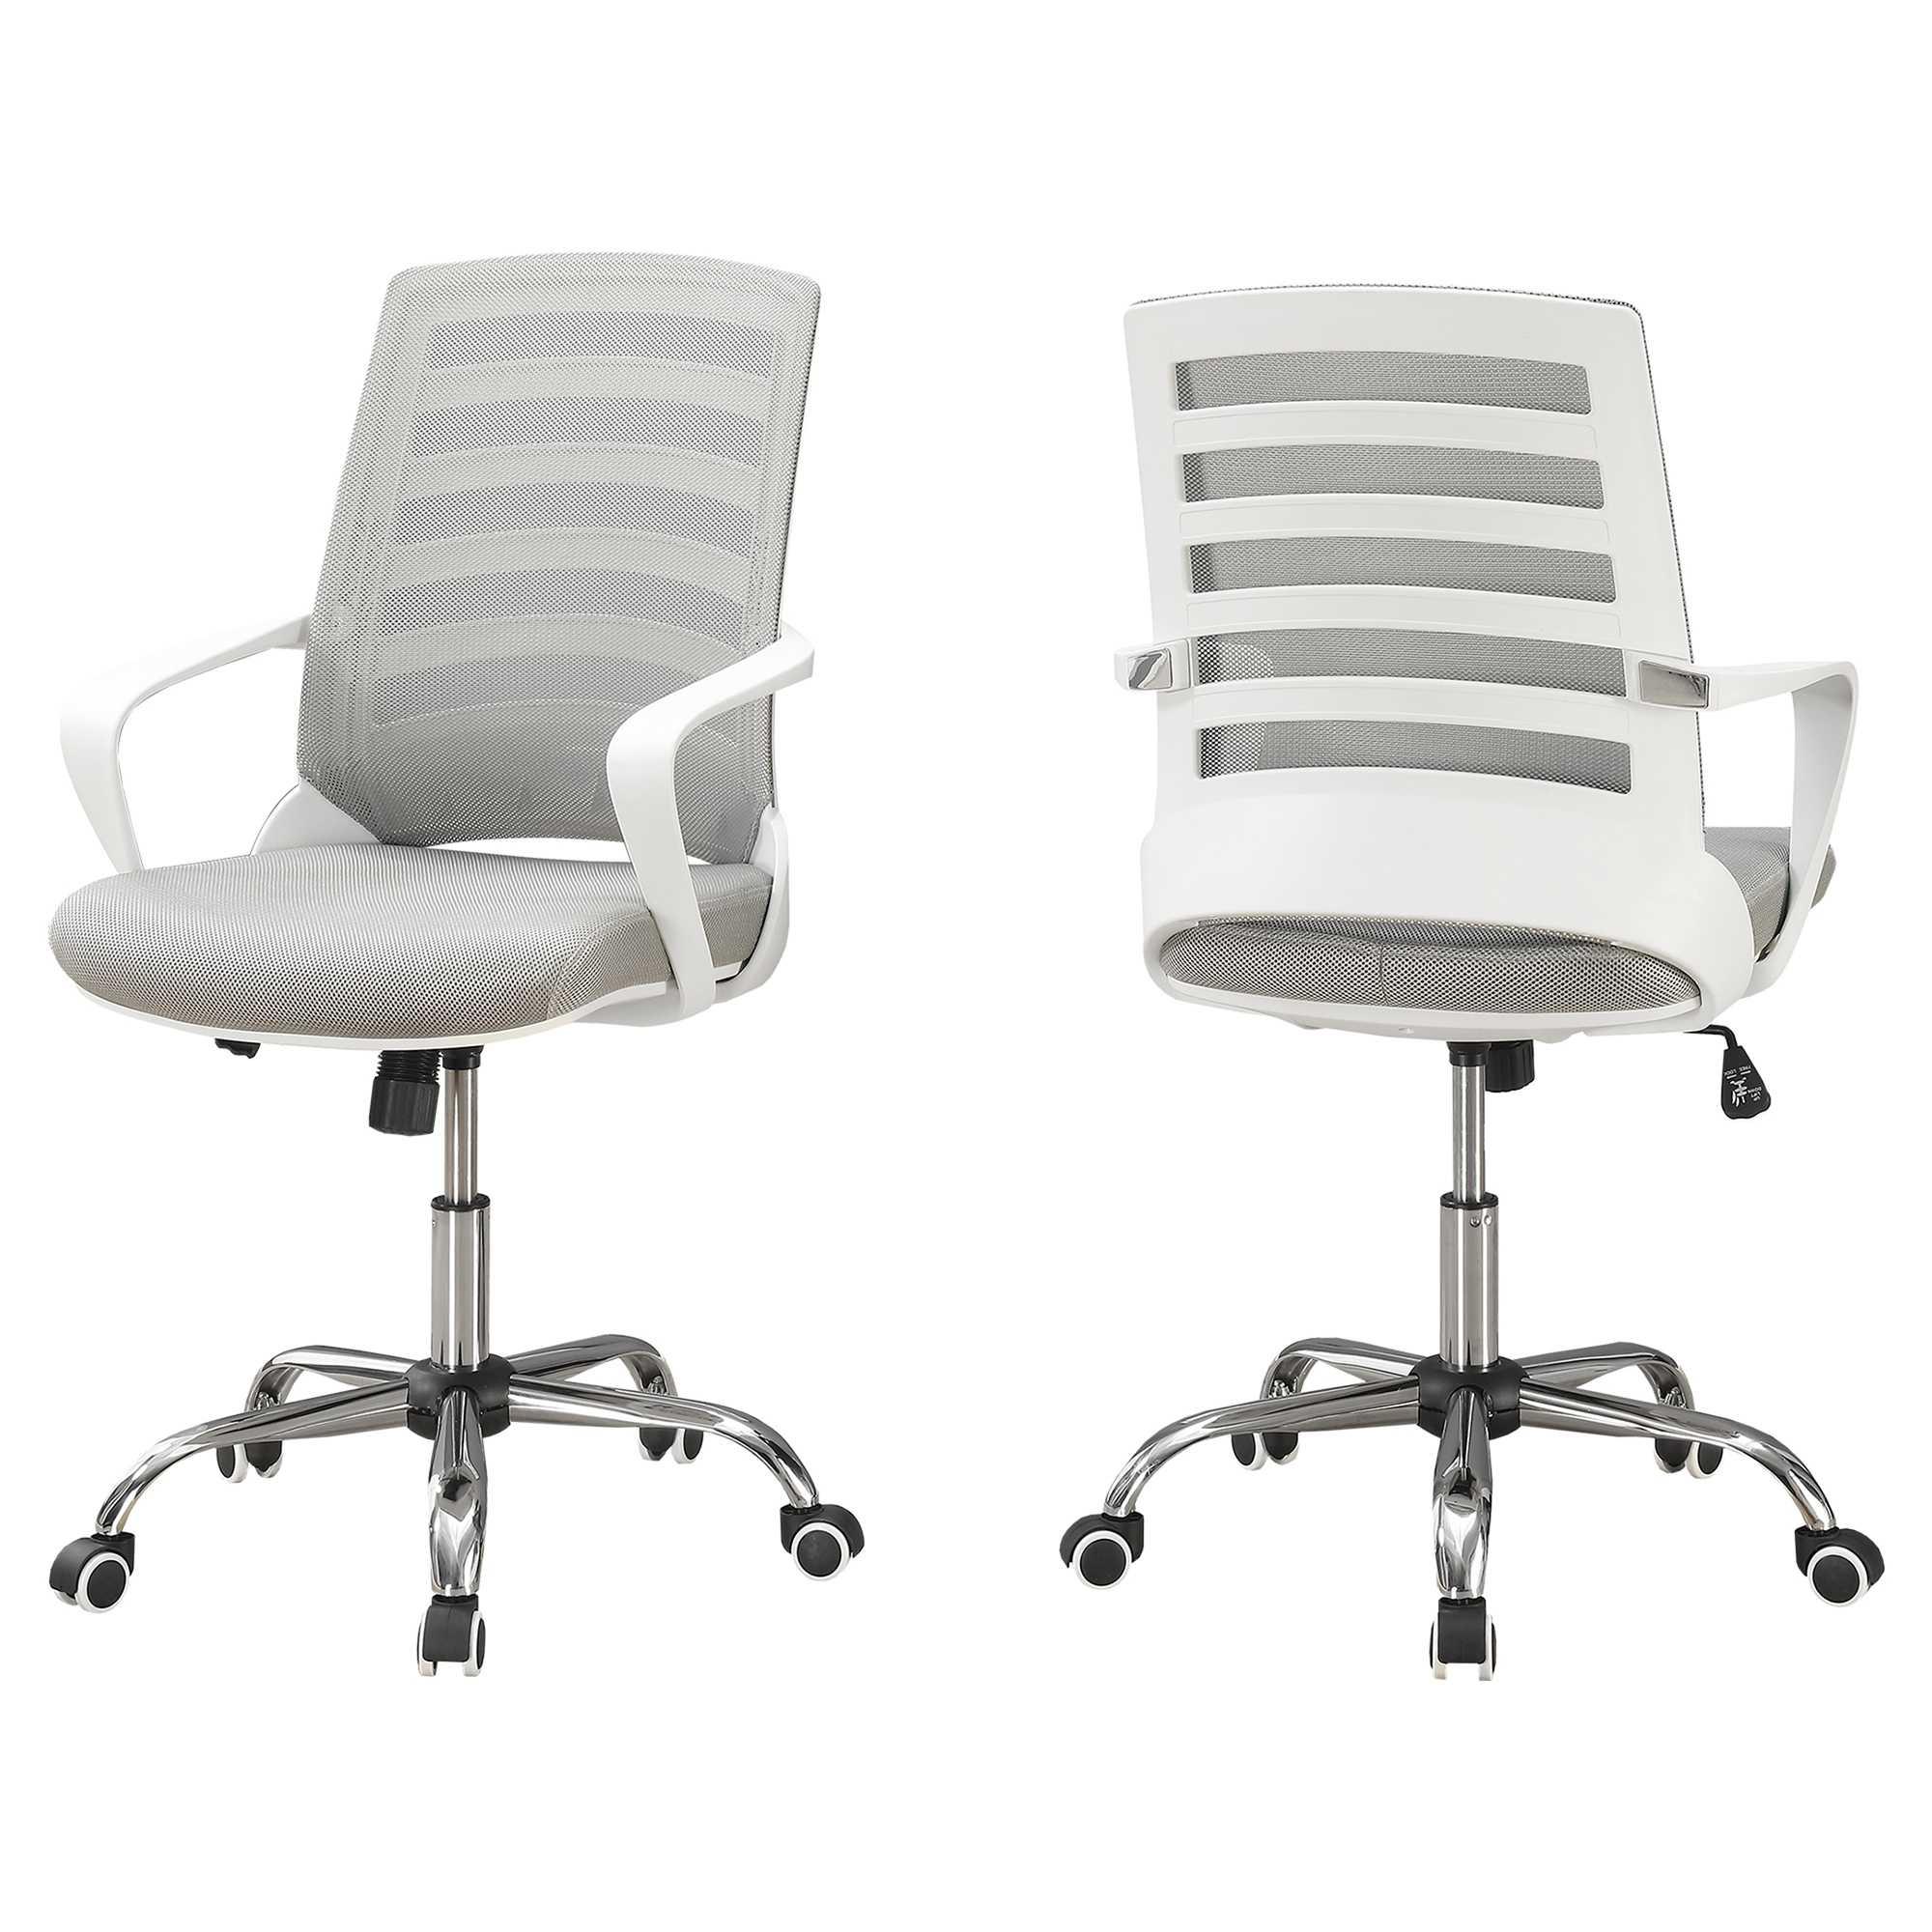 "24.25"" x 24"" x 39"" White Grey Foam Metal Nylon  Multi Position Office Chair"